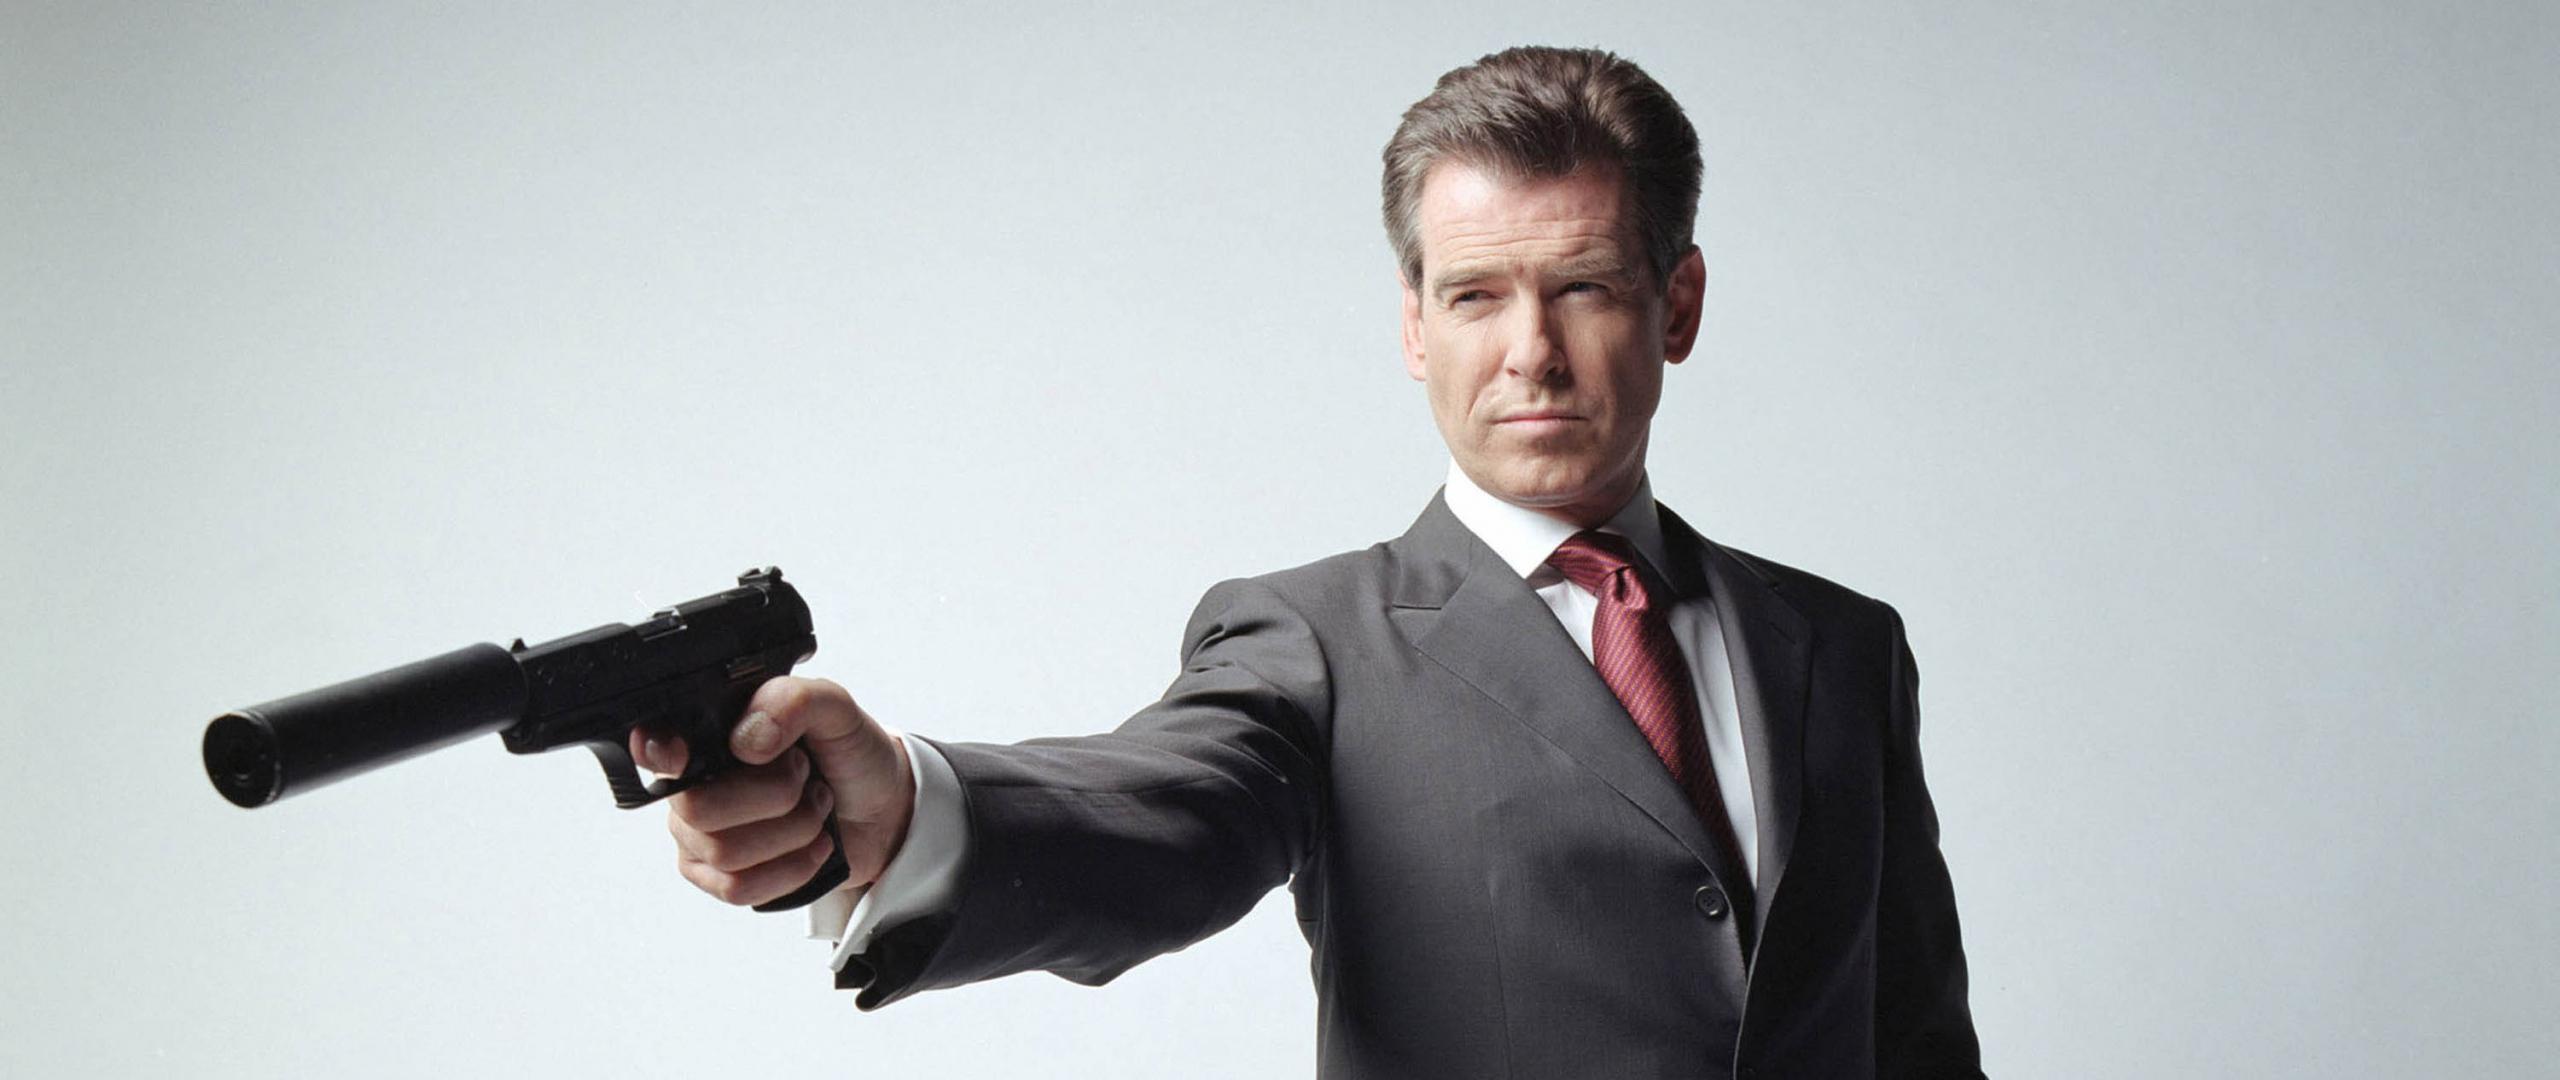 pierce_brosnan_actor_man_brunette_tuxedo_pistol_daring_19169_2560x1080